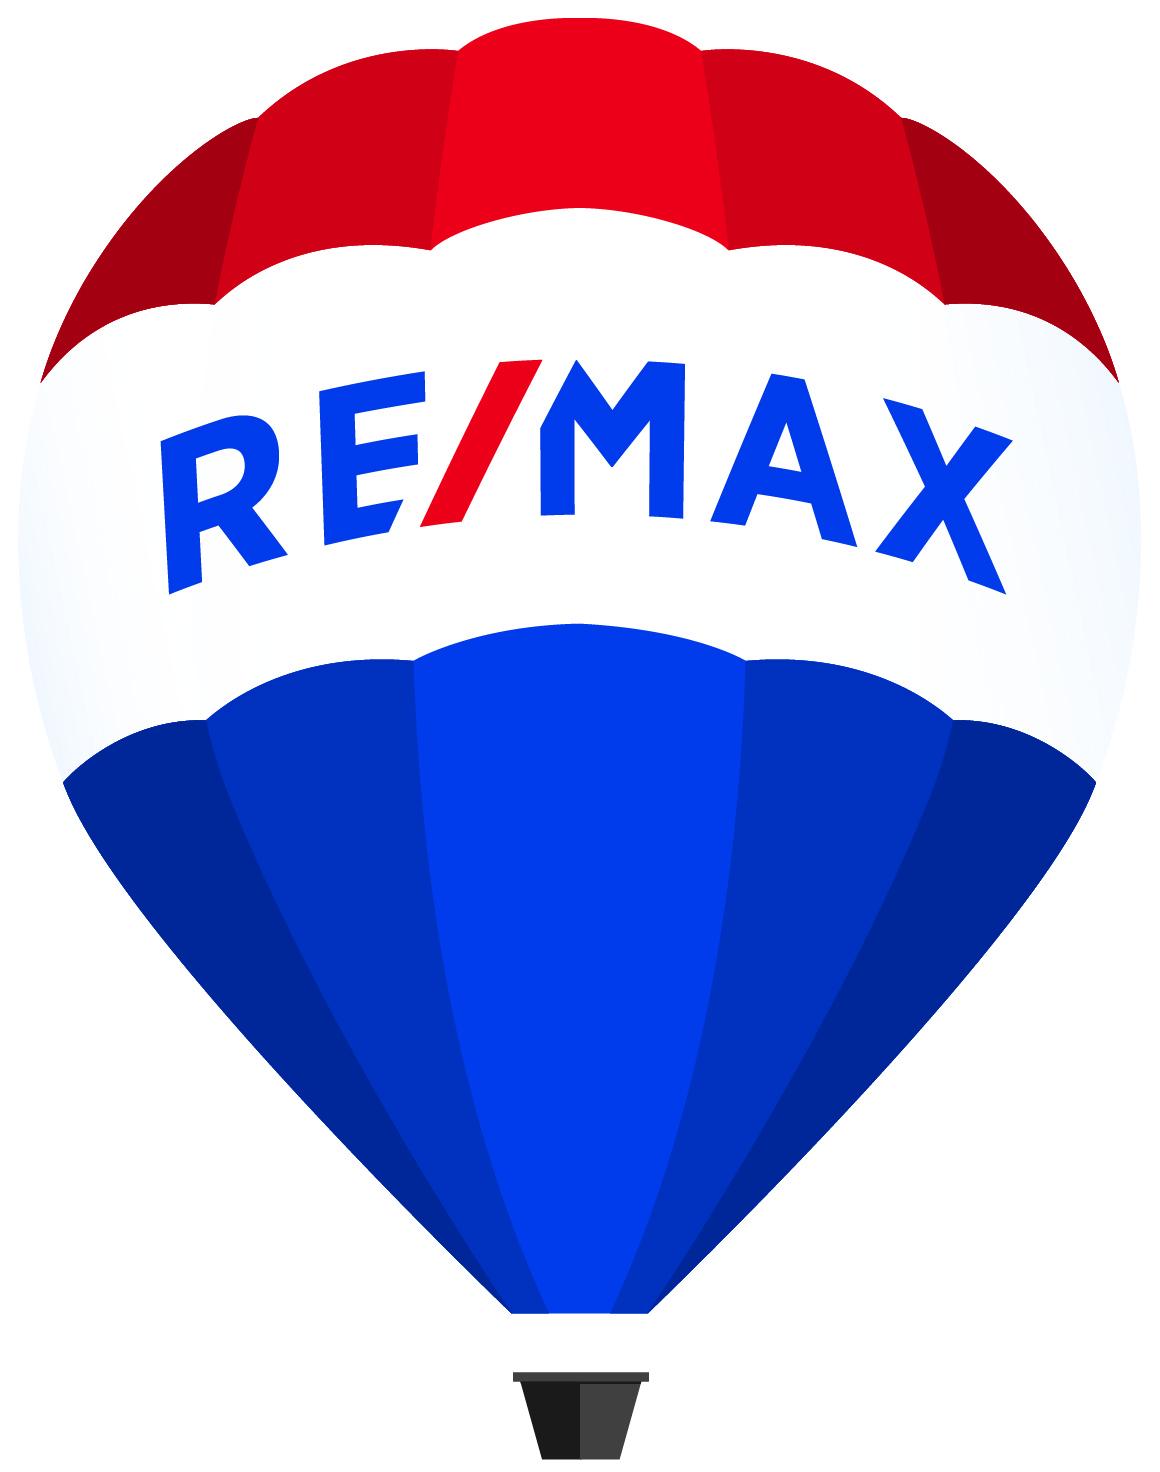 Remax Immobilienagentur